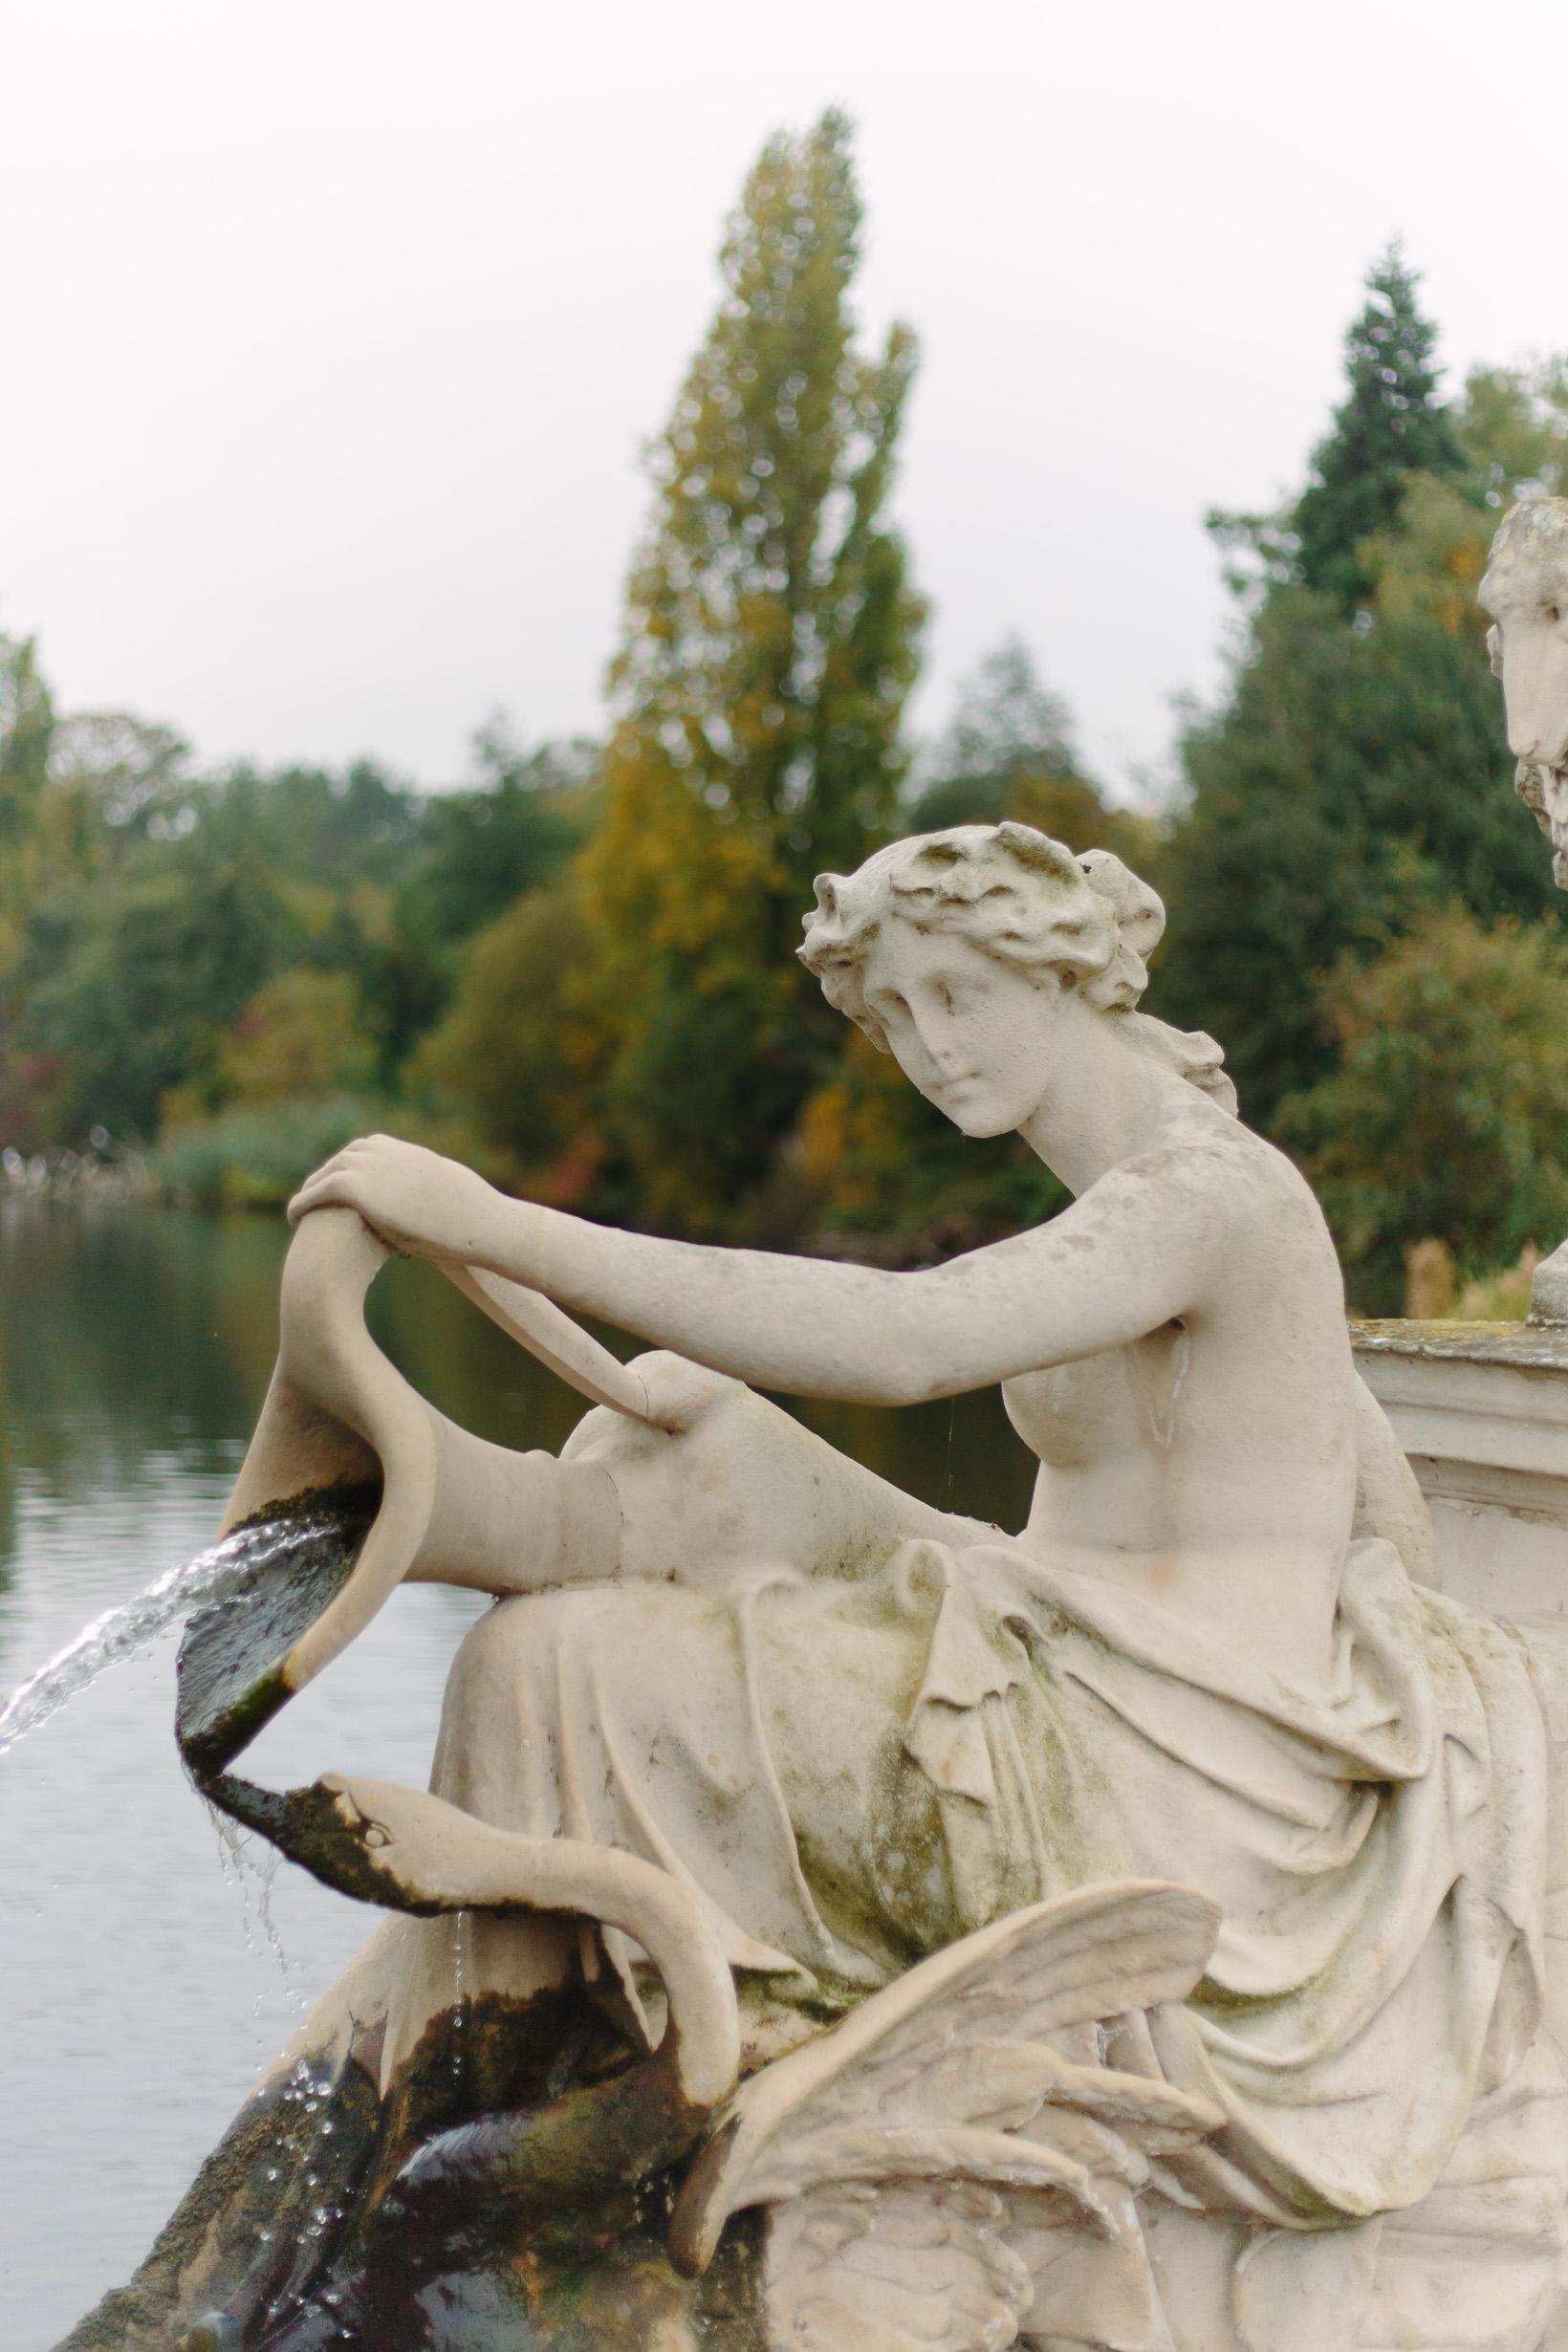 fall-in-hyde-park-london-4163